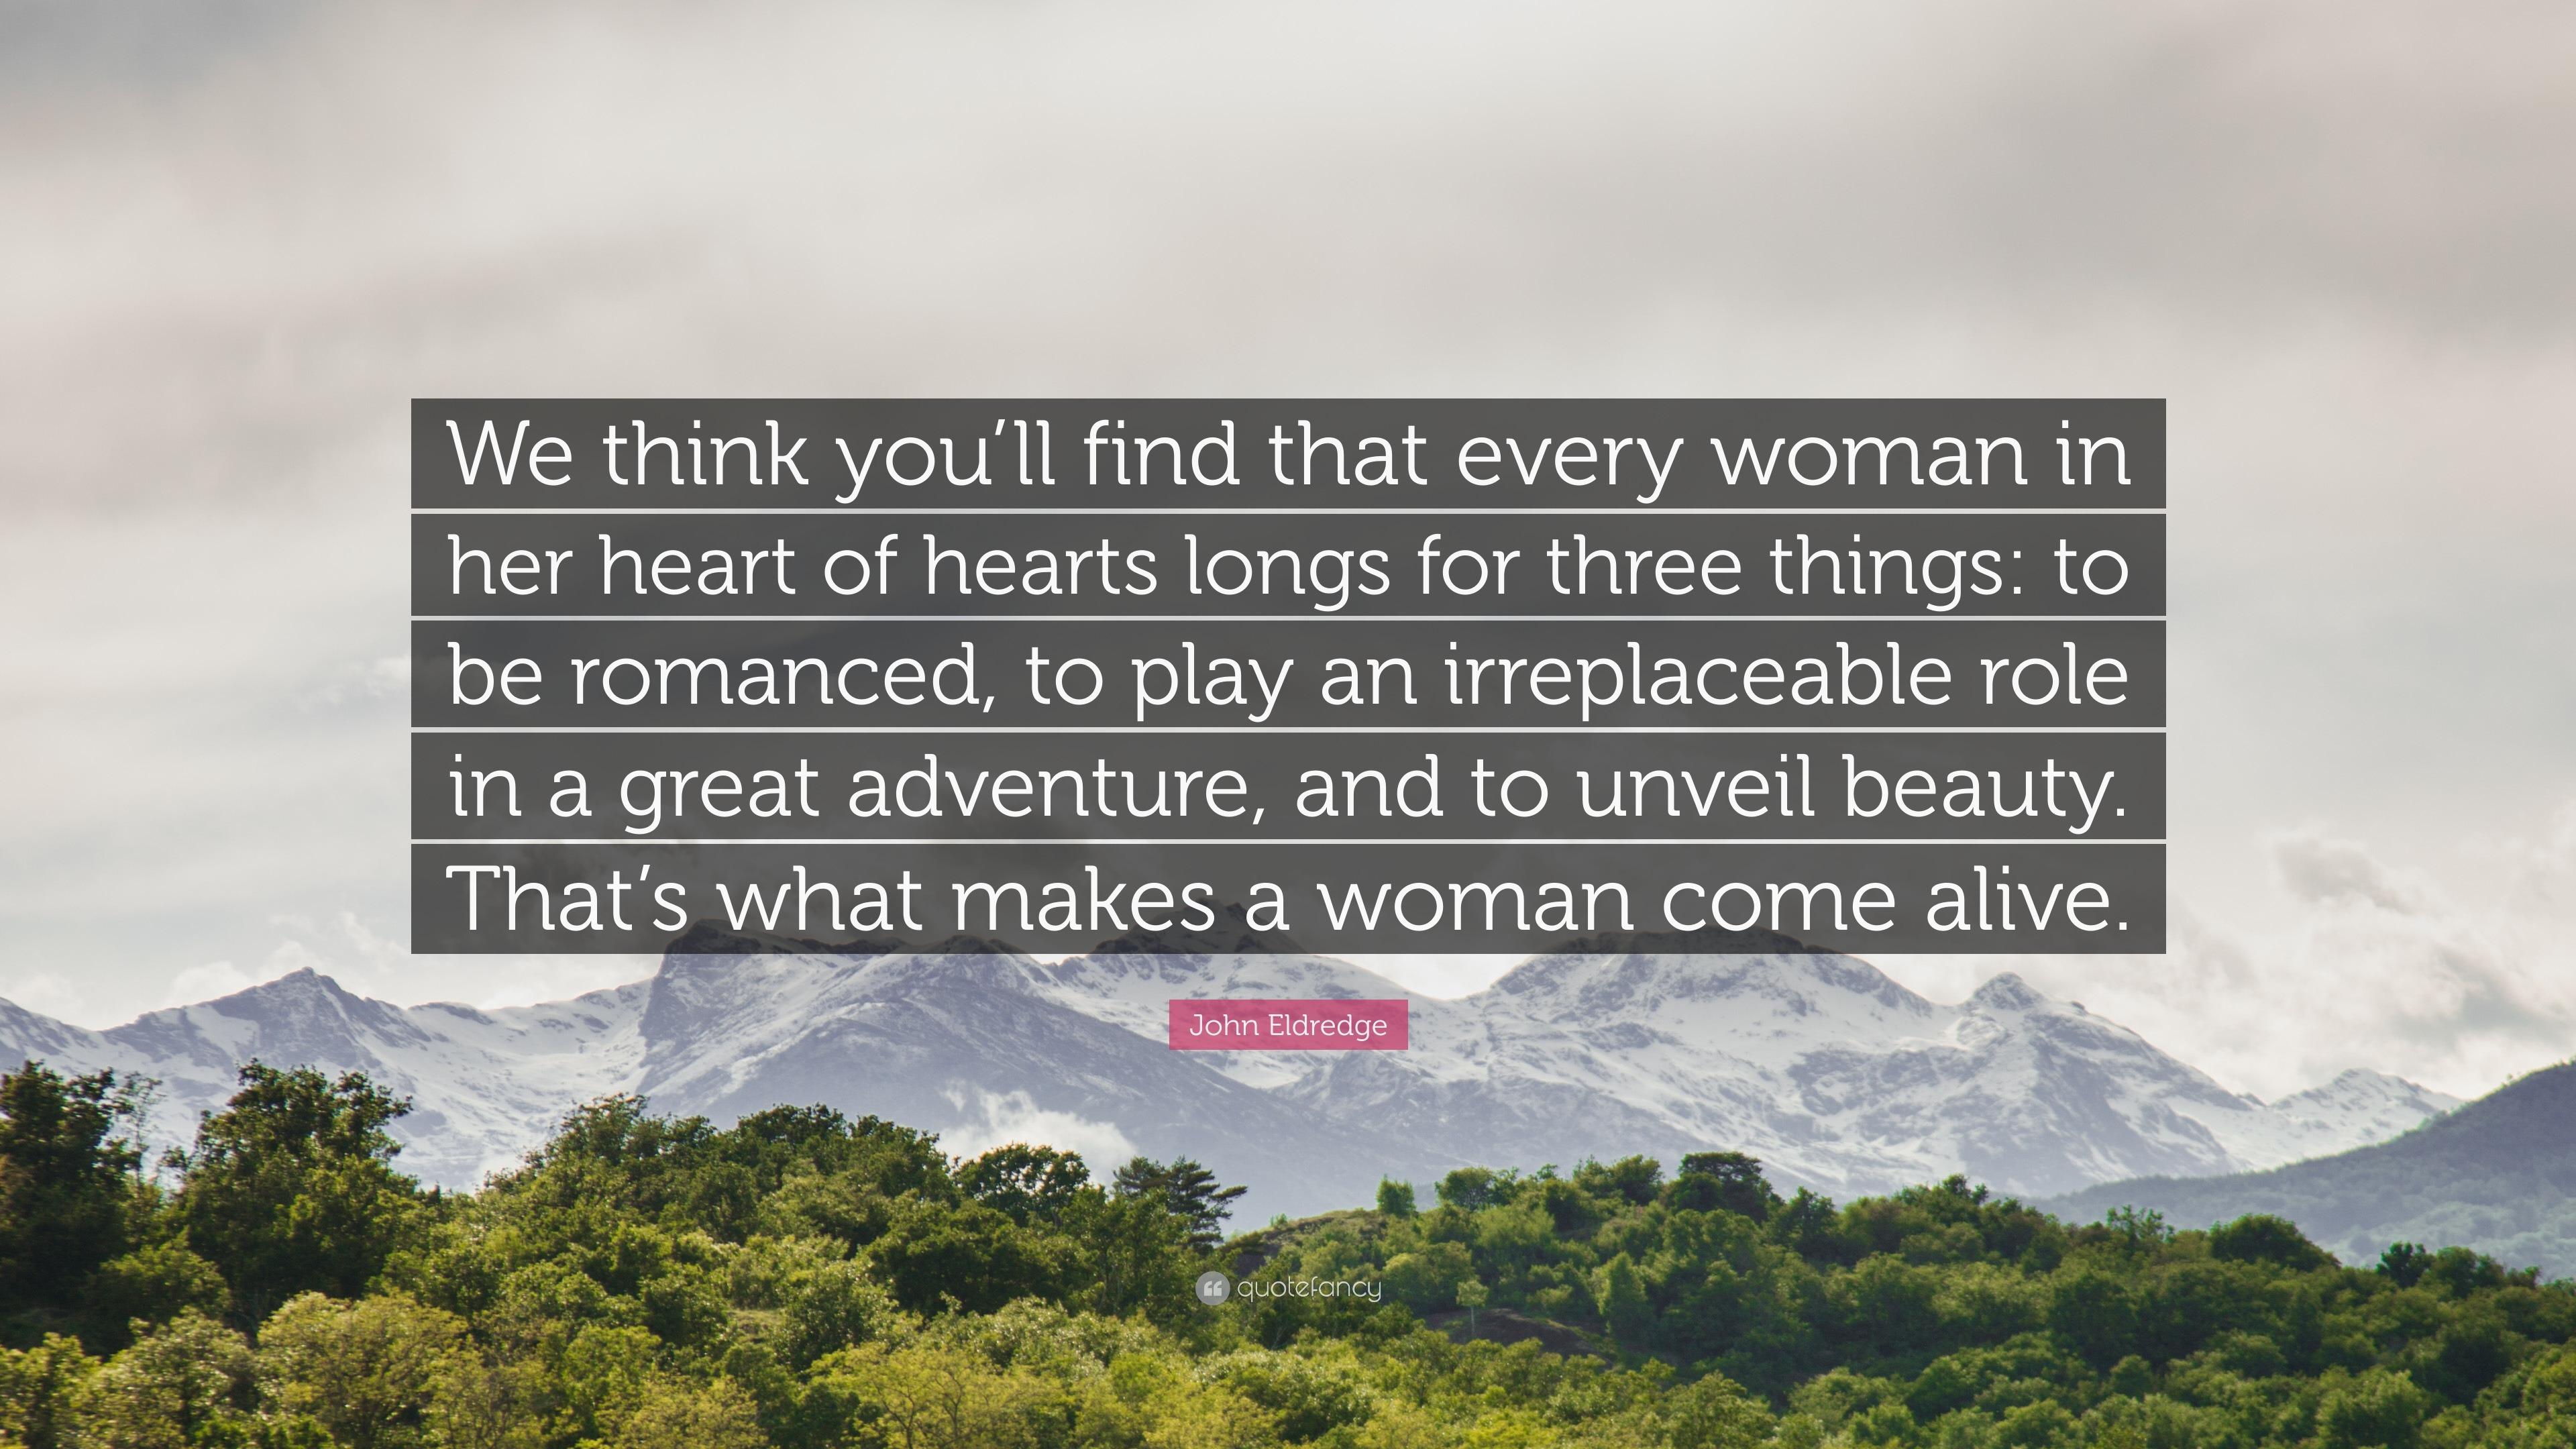 John Eldredge Wild At Heart Quotes Quotesgram: John Eldredge Quotes (65 Wallpapers)